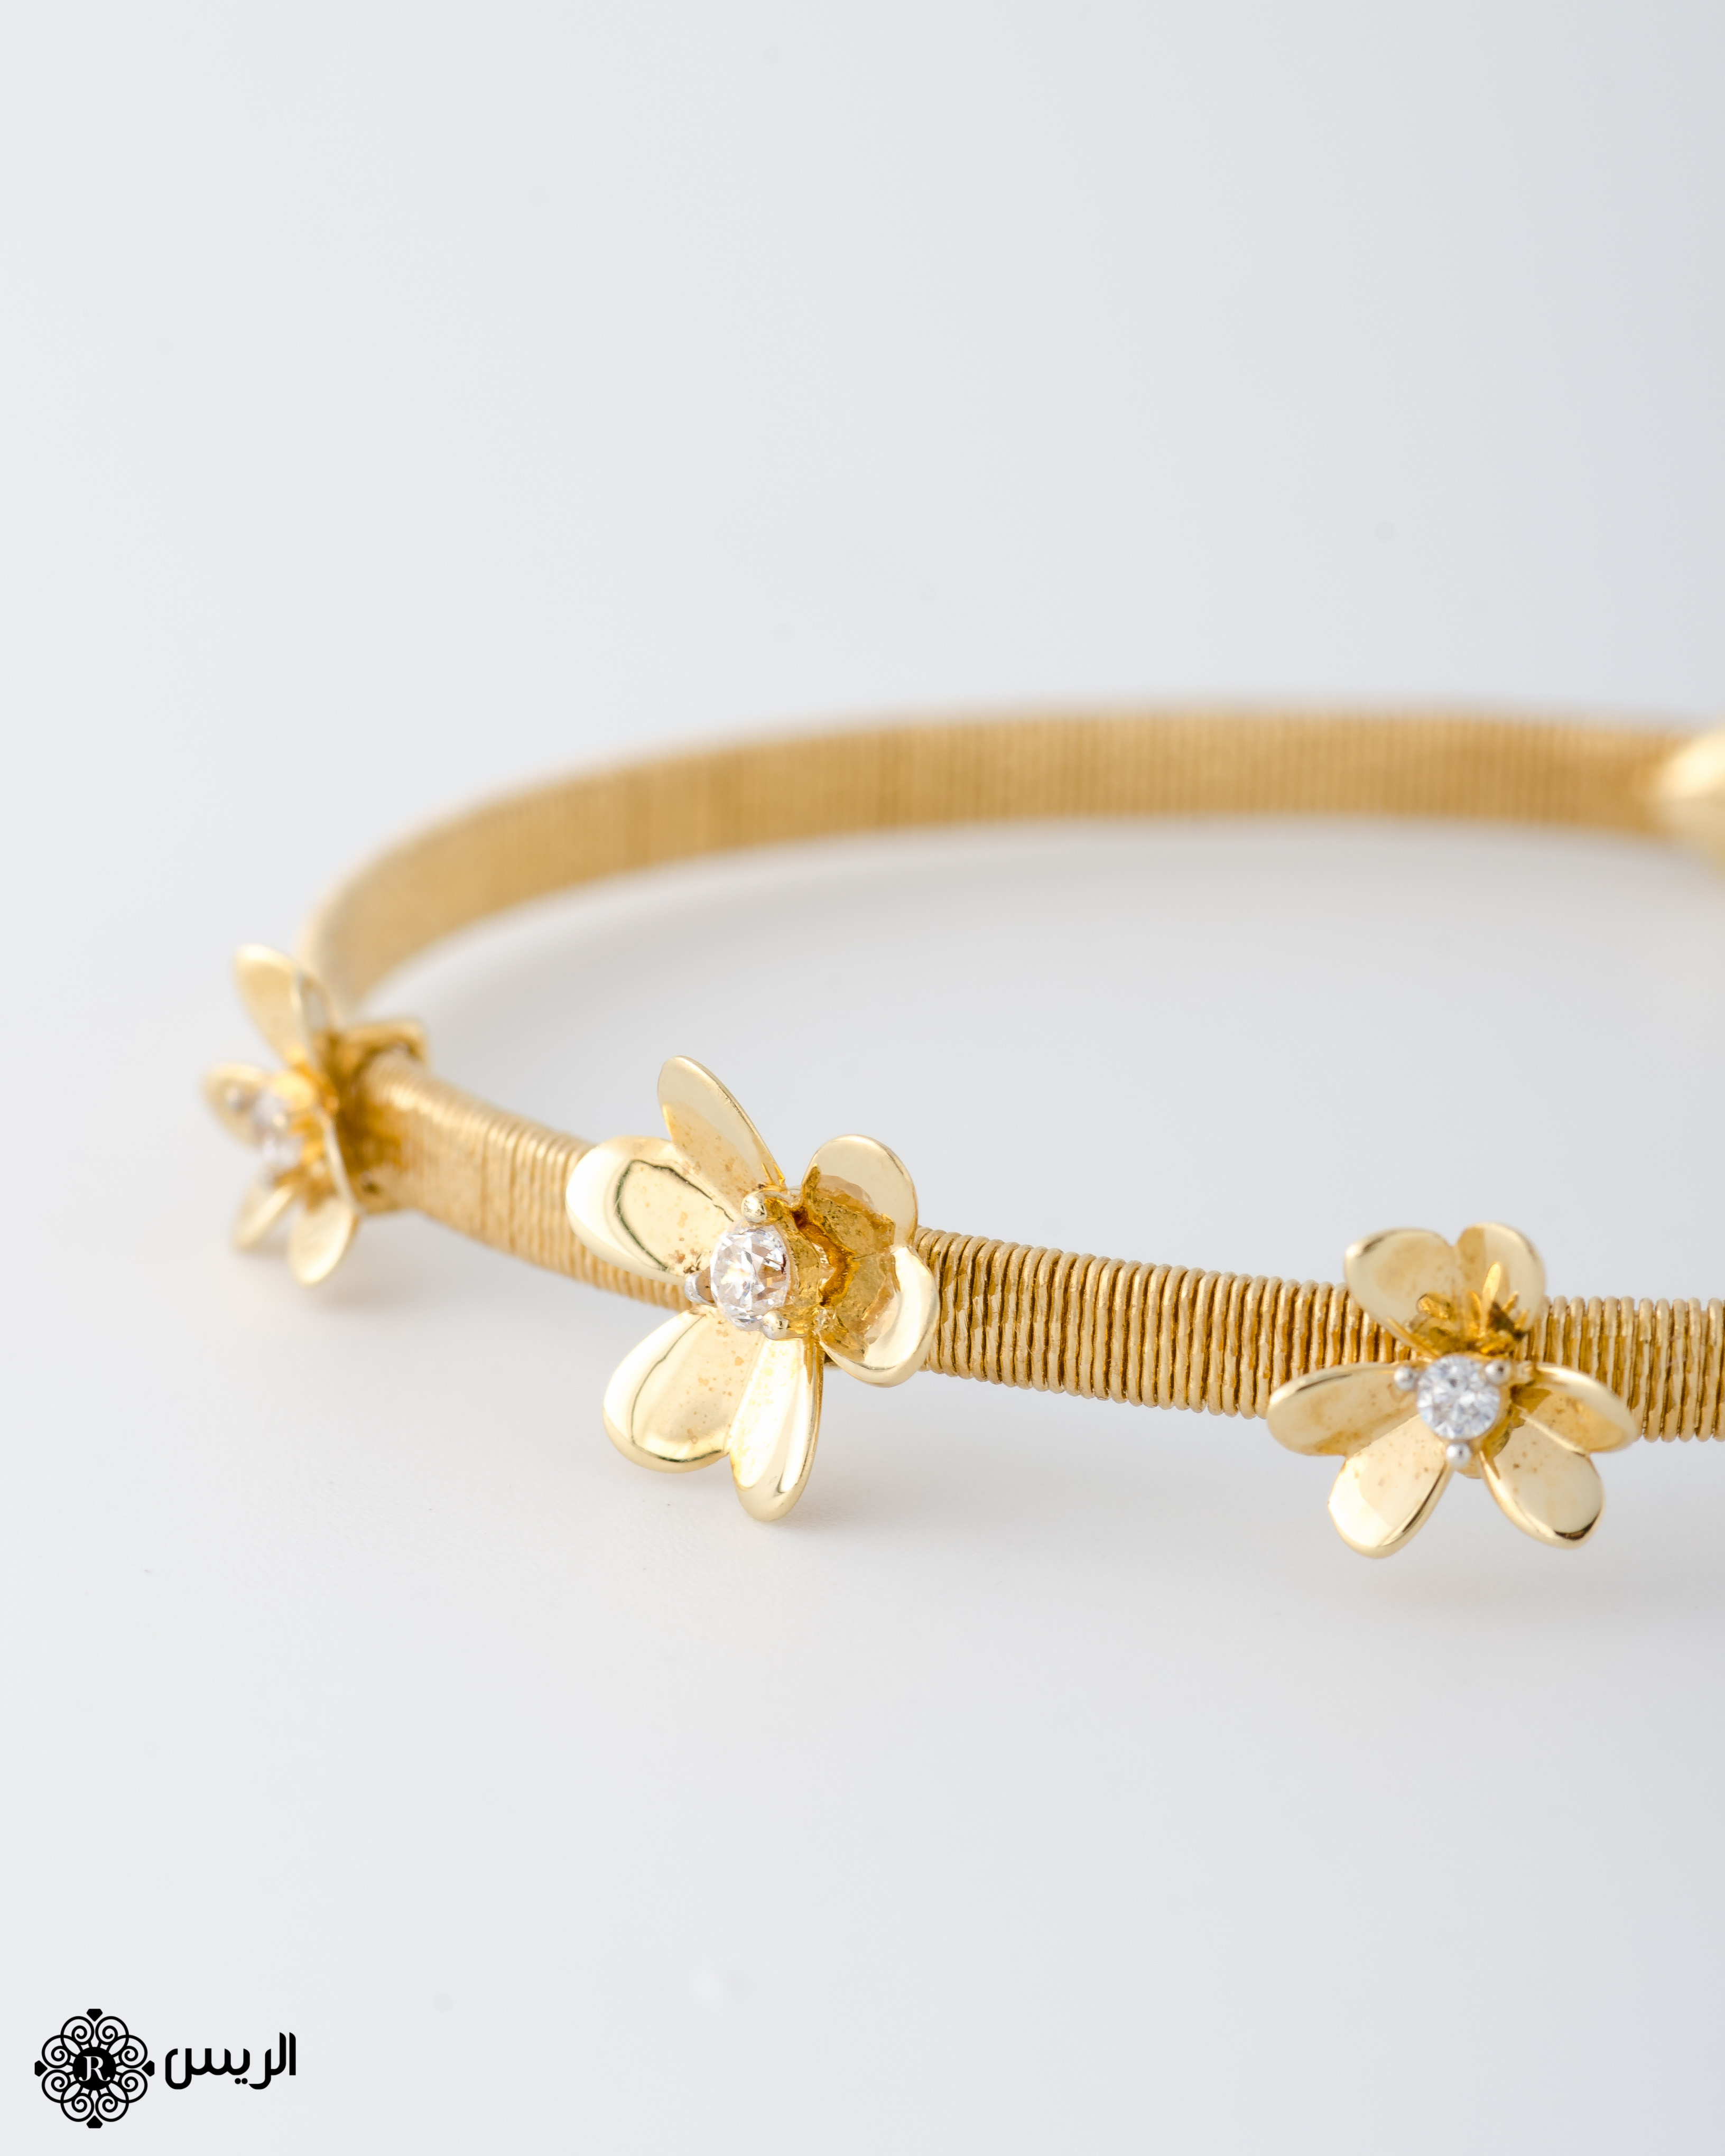 Raies jewelry Bangle Flowers Casual Design إسورة بوردات تصميم سبور الريس للمجوهرات